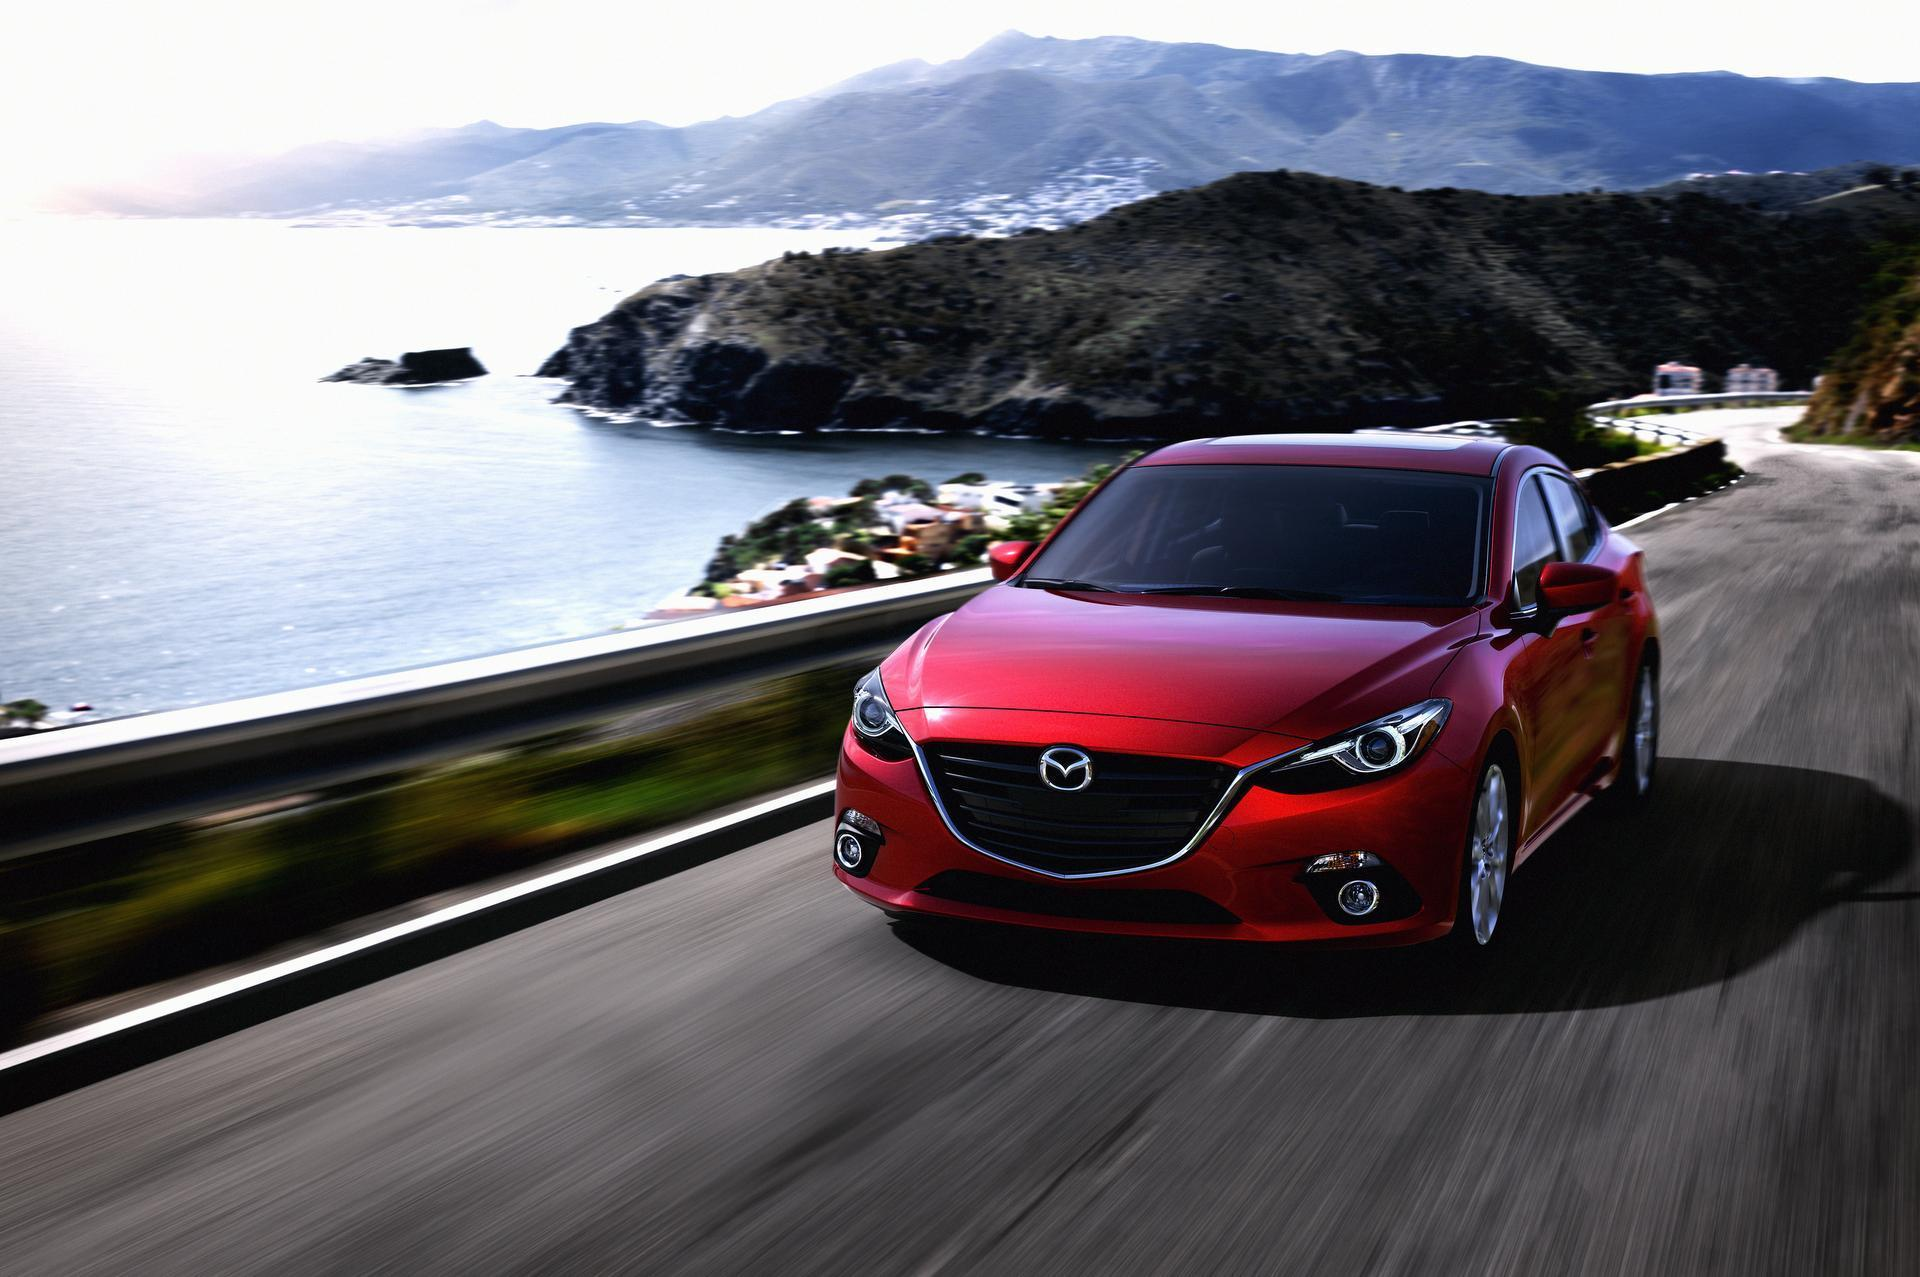 Mazdaspeed 3 Wallpapers Wallpaper Cave